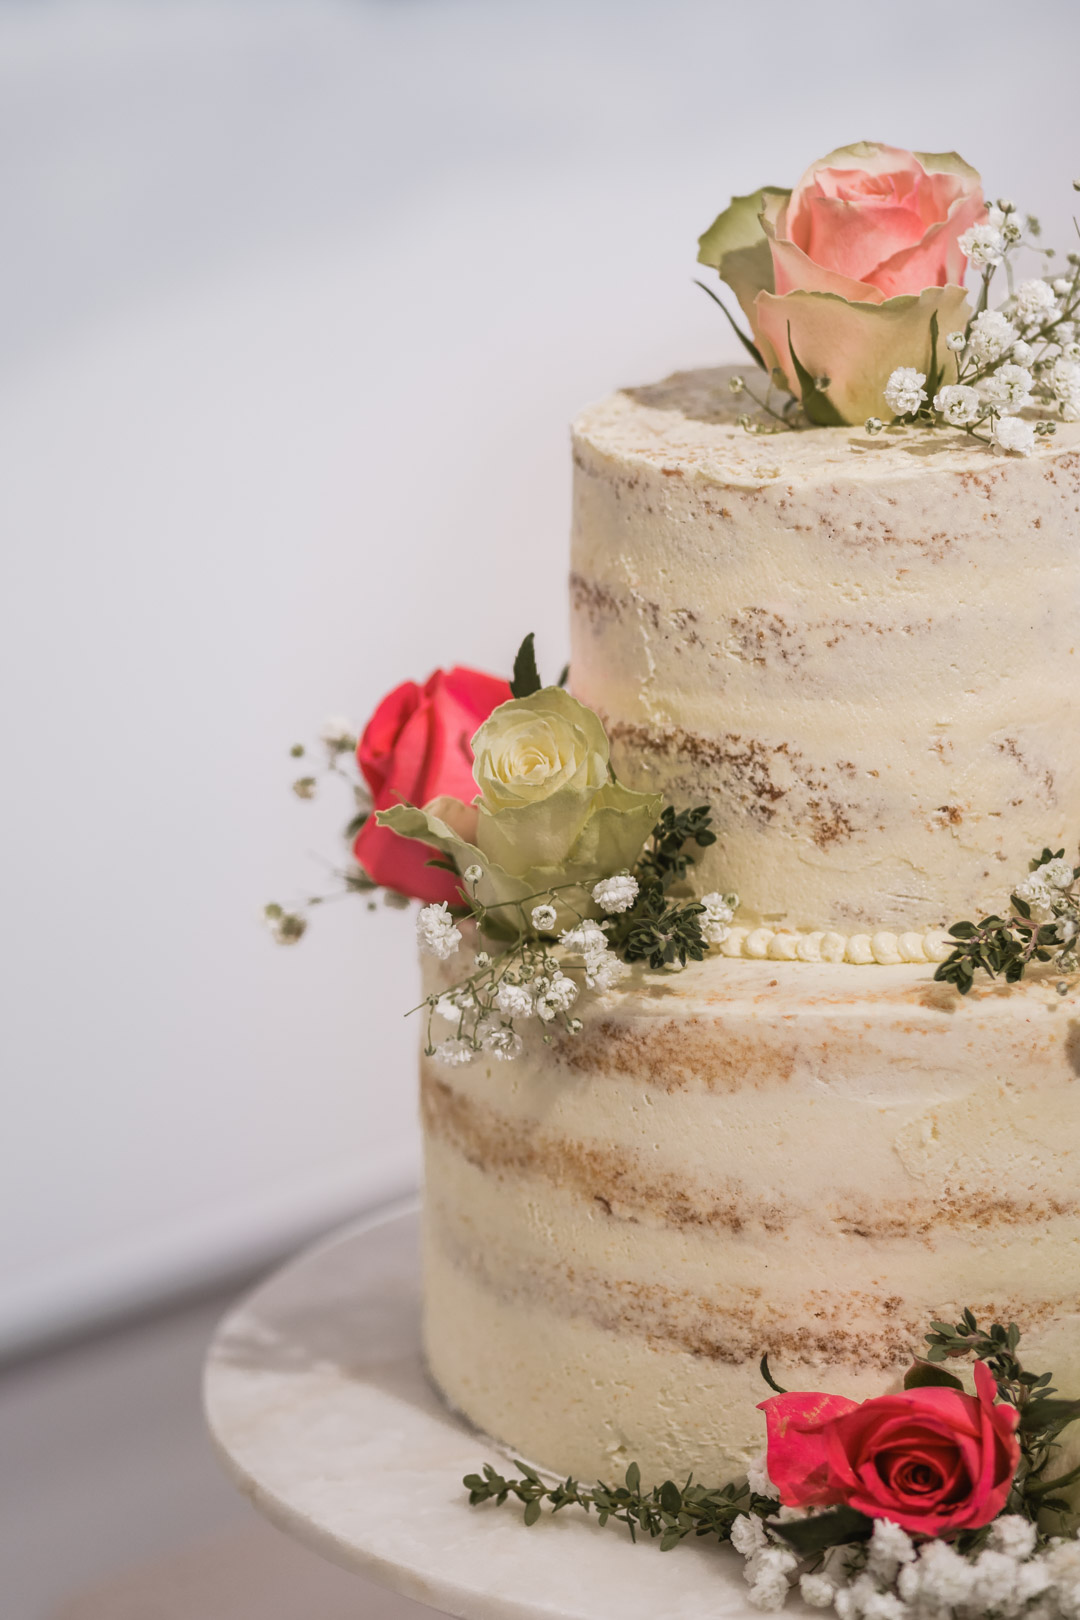 Cakes by  The Hazlebury Kitchen